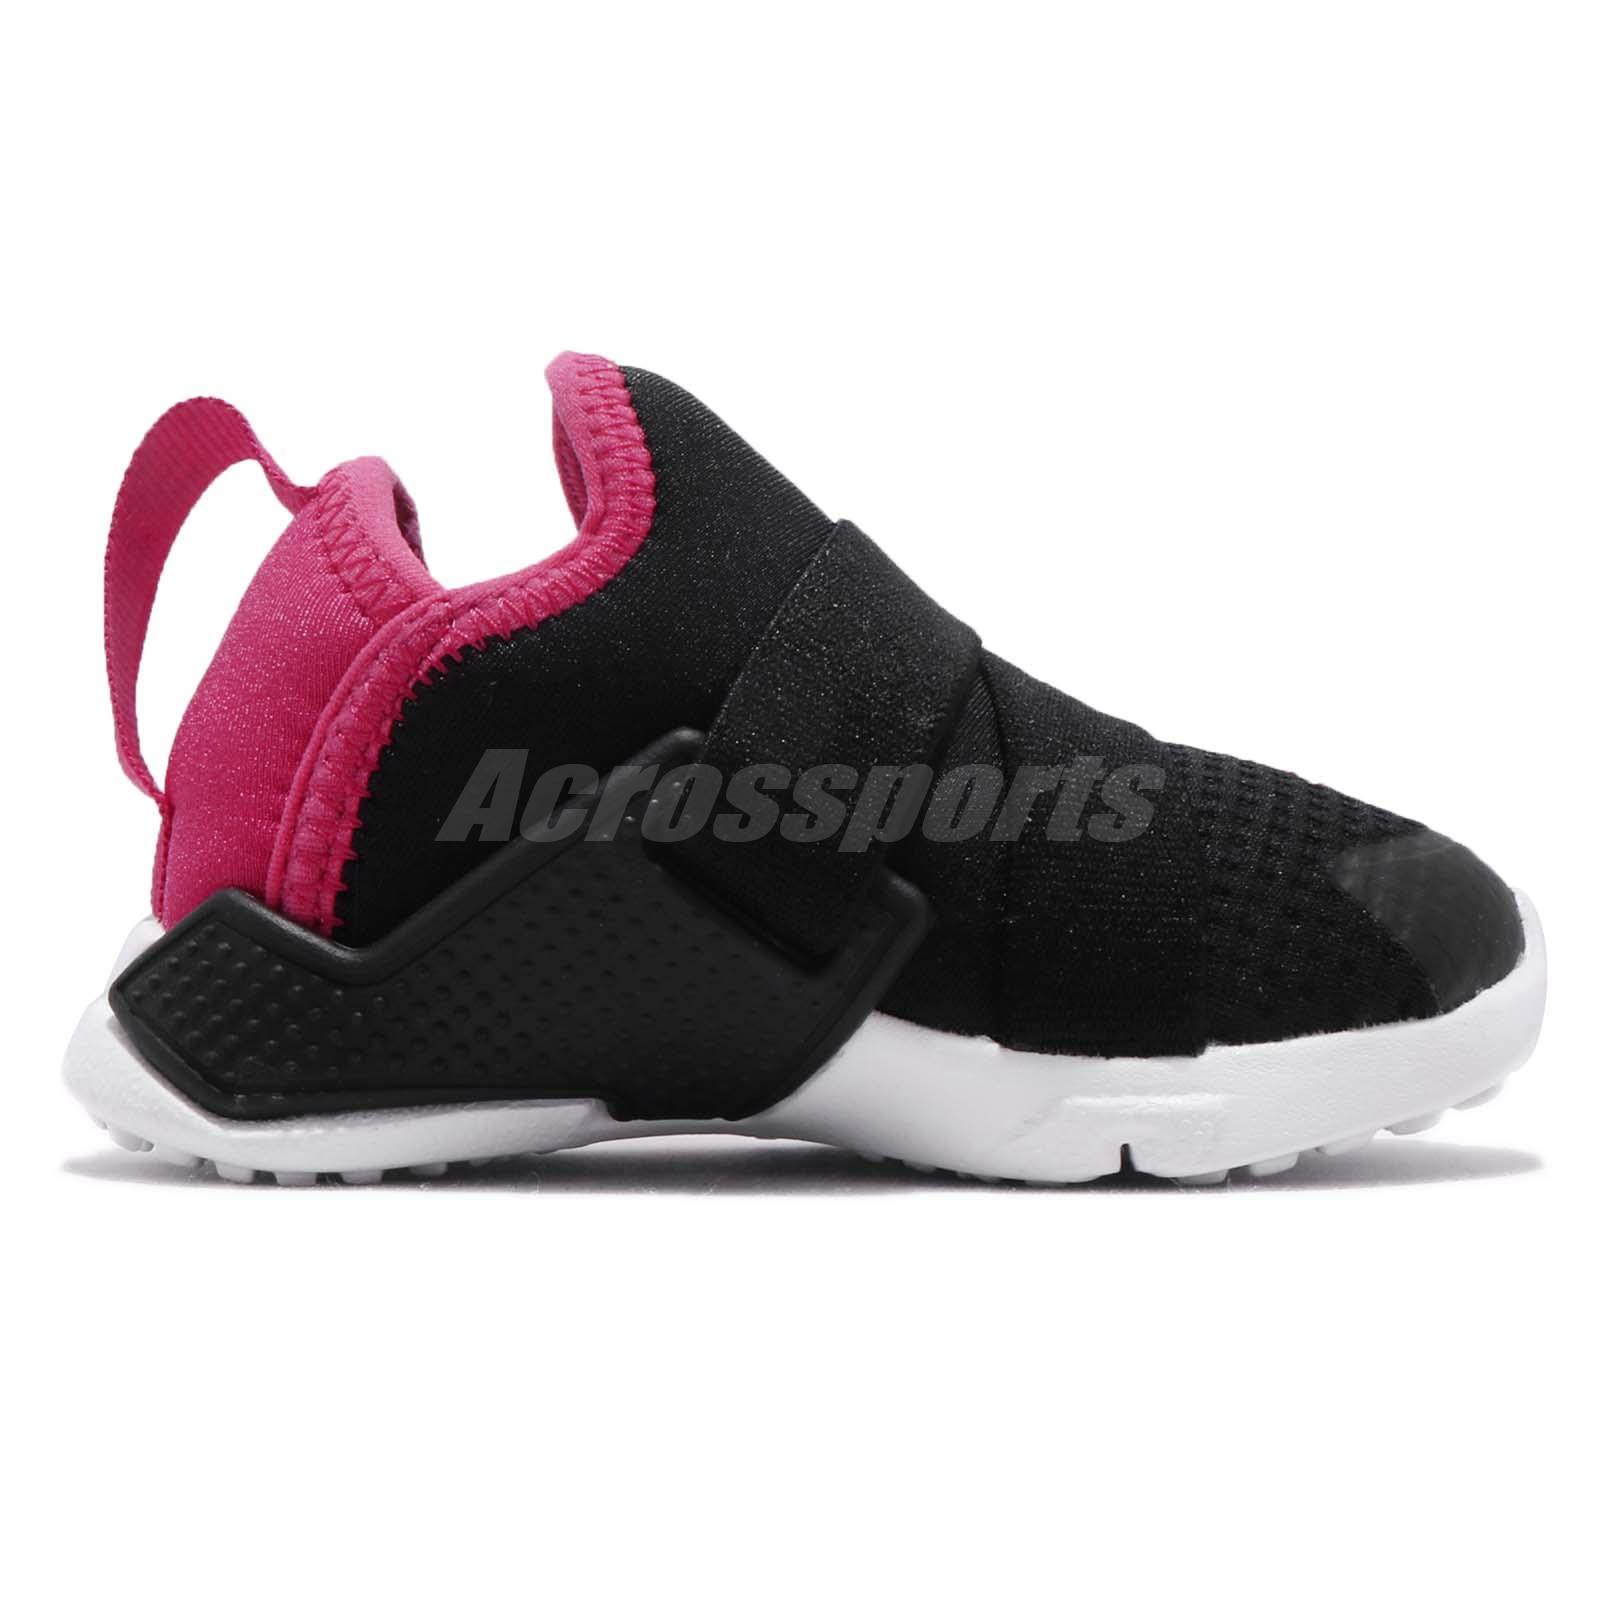 2a33a129337e Nike Huarache Extreme TD Black Rush Pink White Toddler Infant Shoes ...